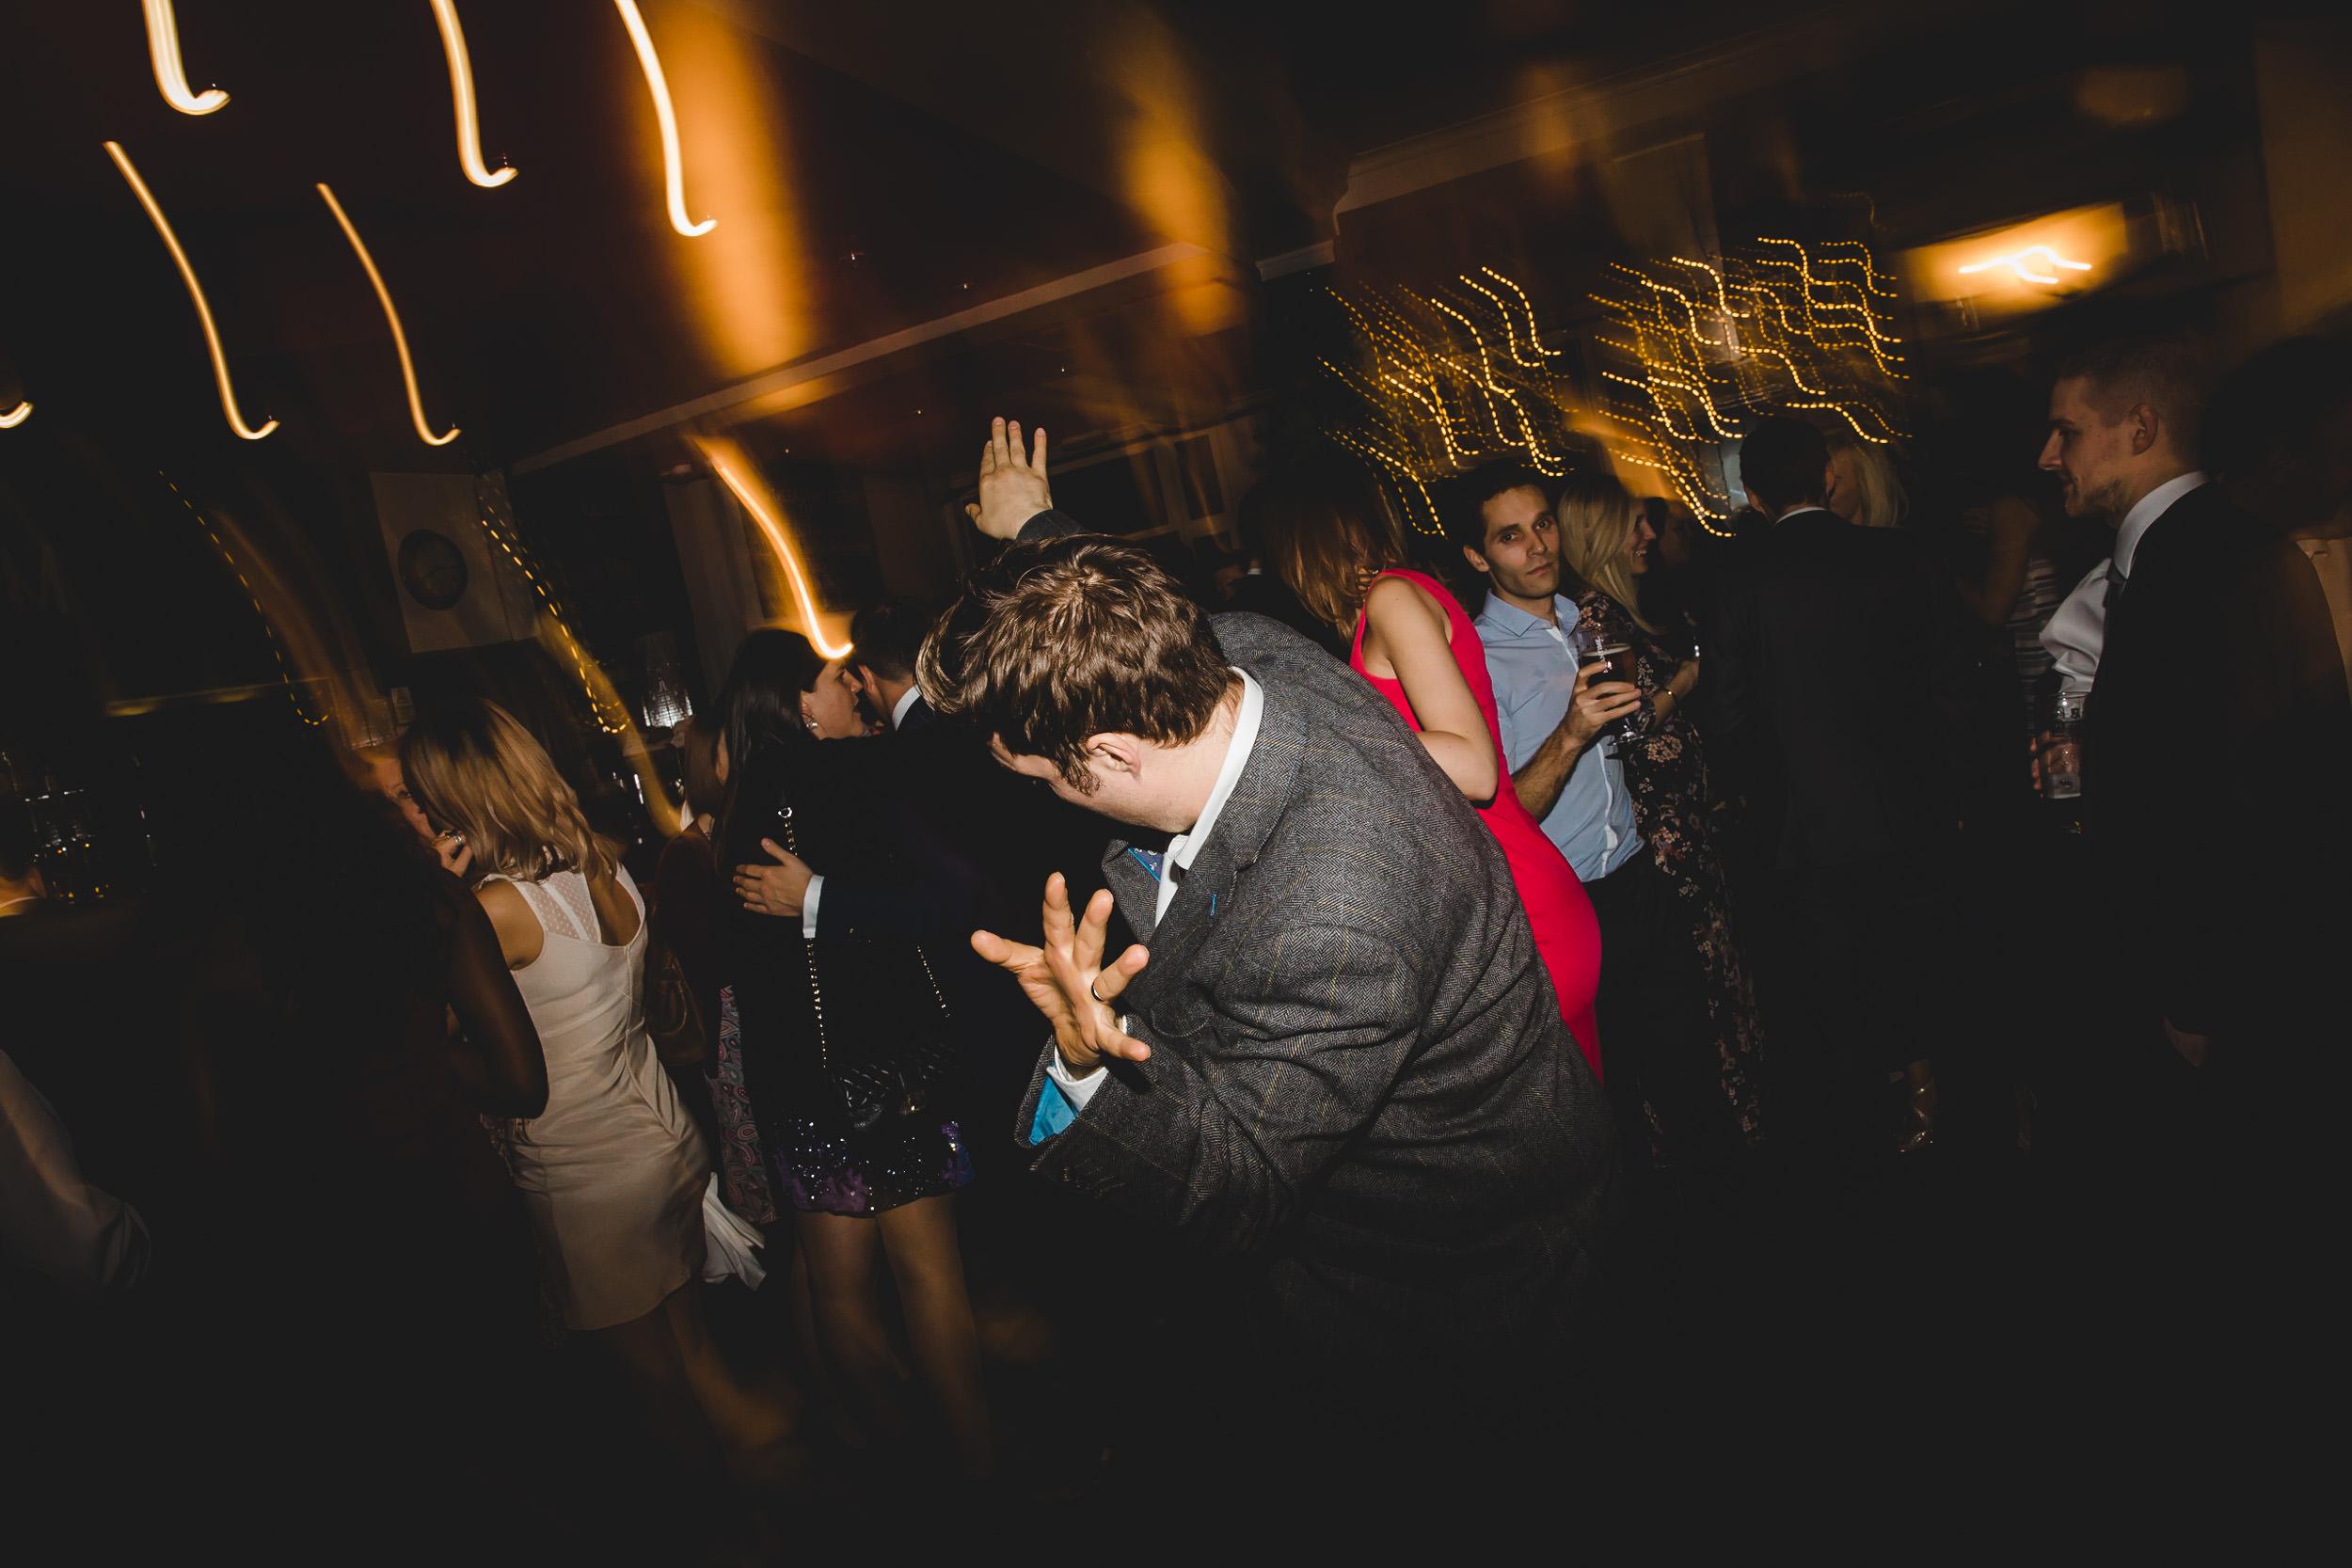 dancing in easton pub london